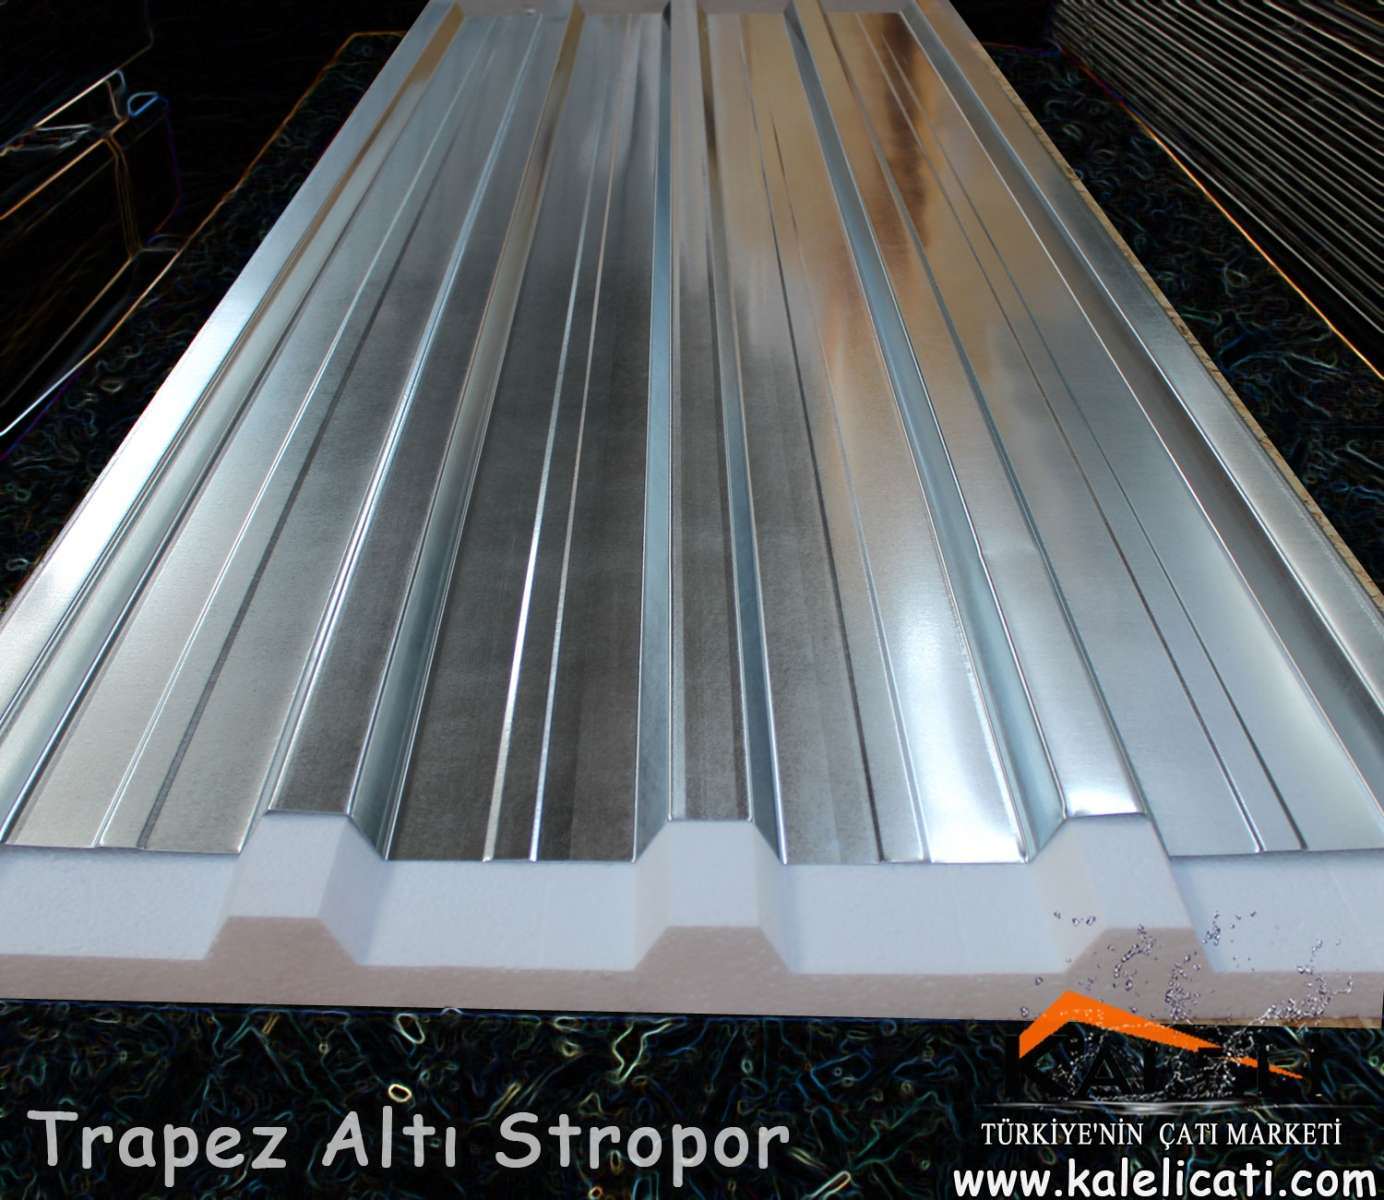 Trapez sac altı stropor 87*200 cm